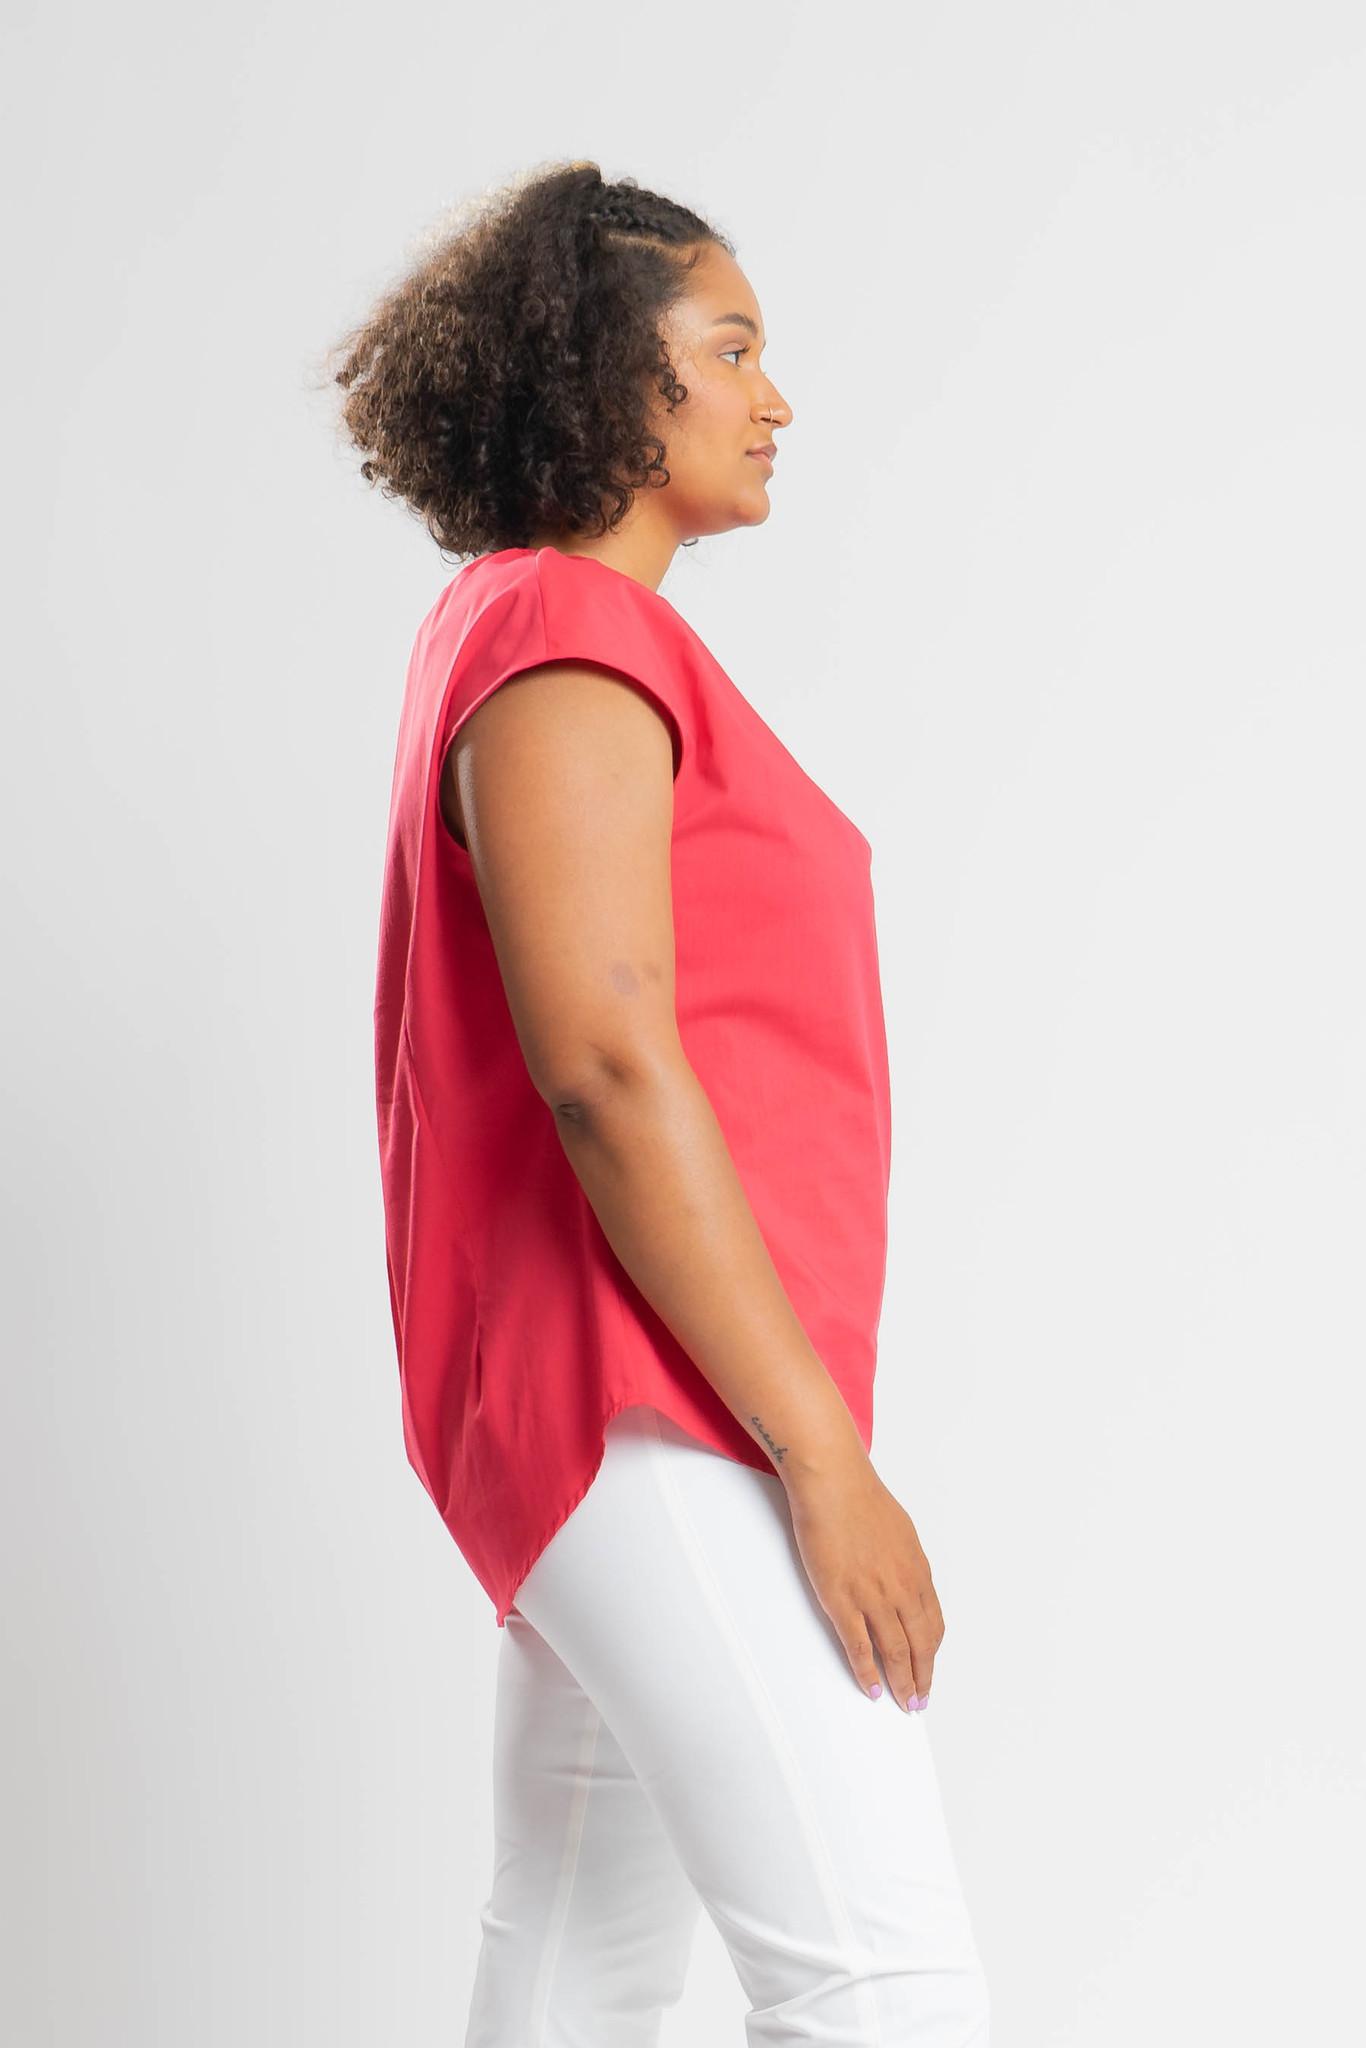 ANZU Shirt aus Bauwoll-Stretch-4